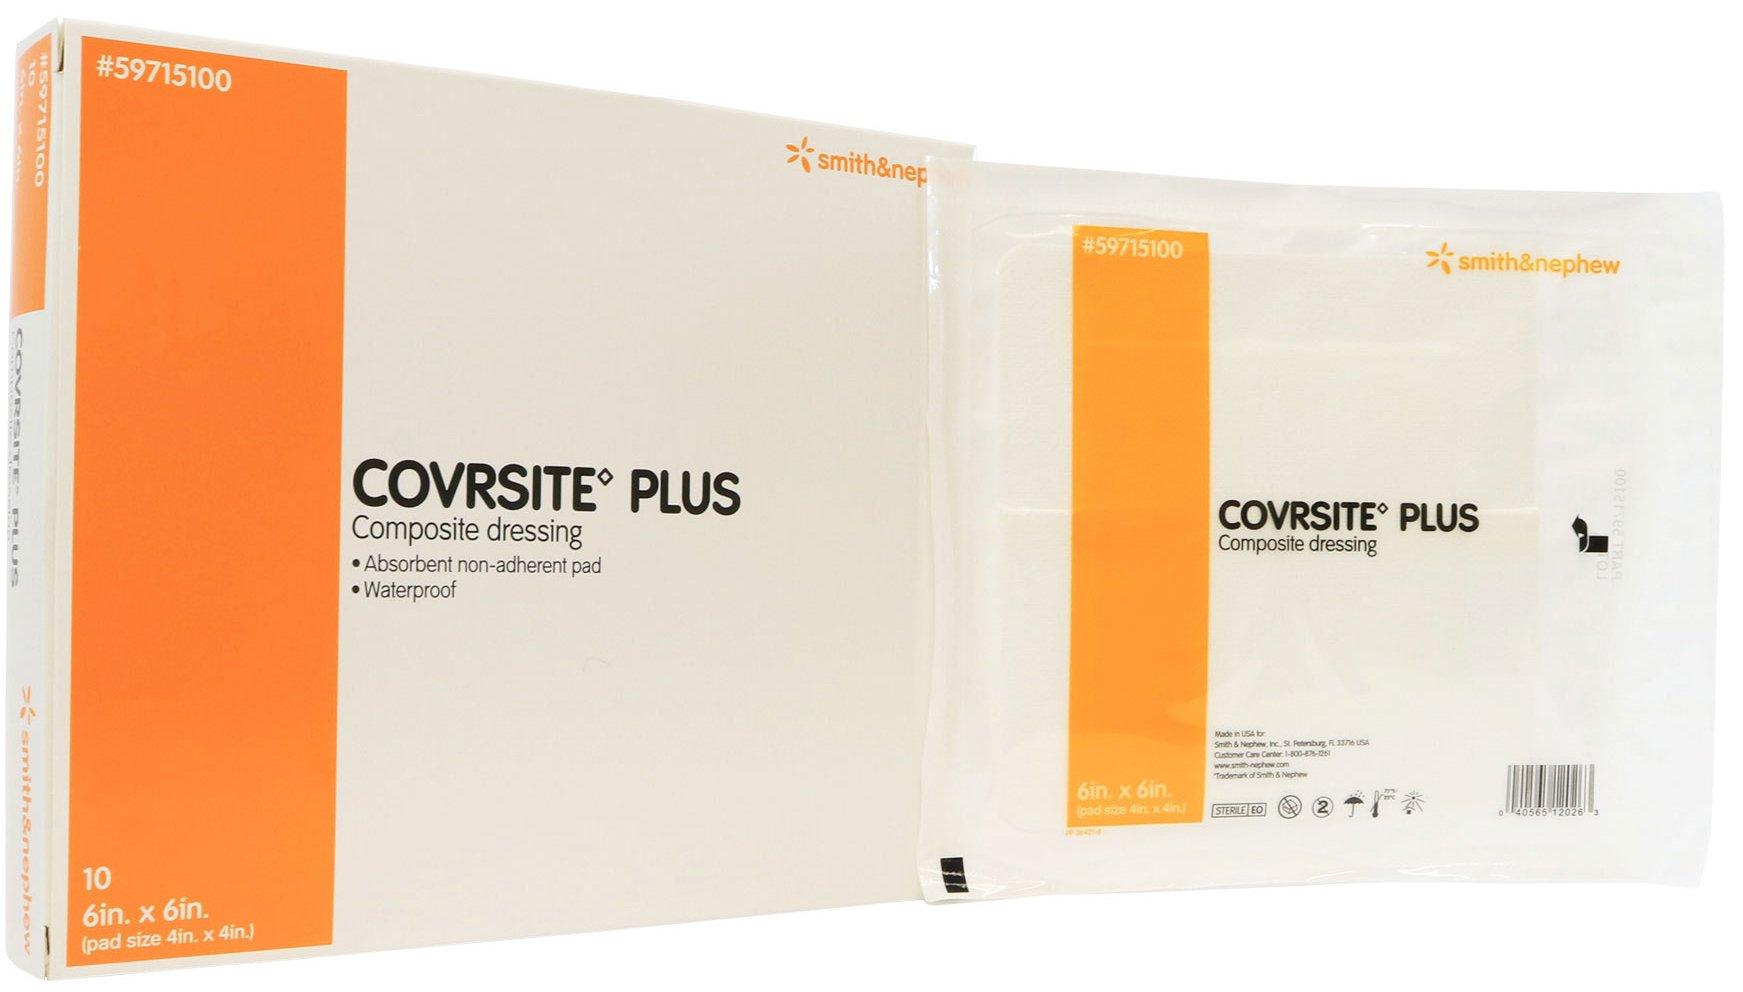 Covrsite Plus Waterproof Composite Dressing 6'' x 6'' - Box of 10